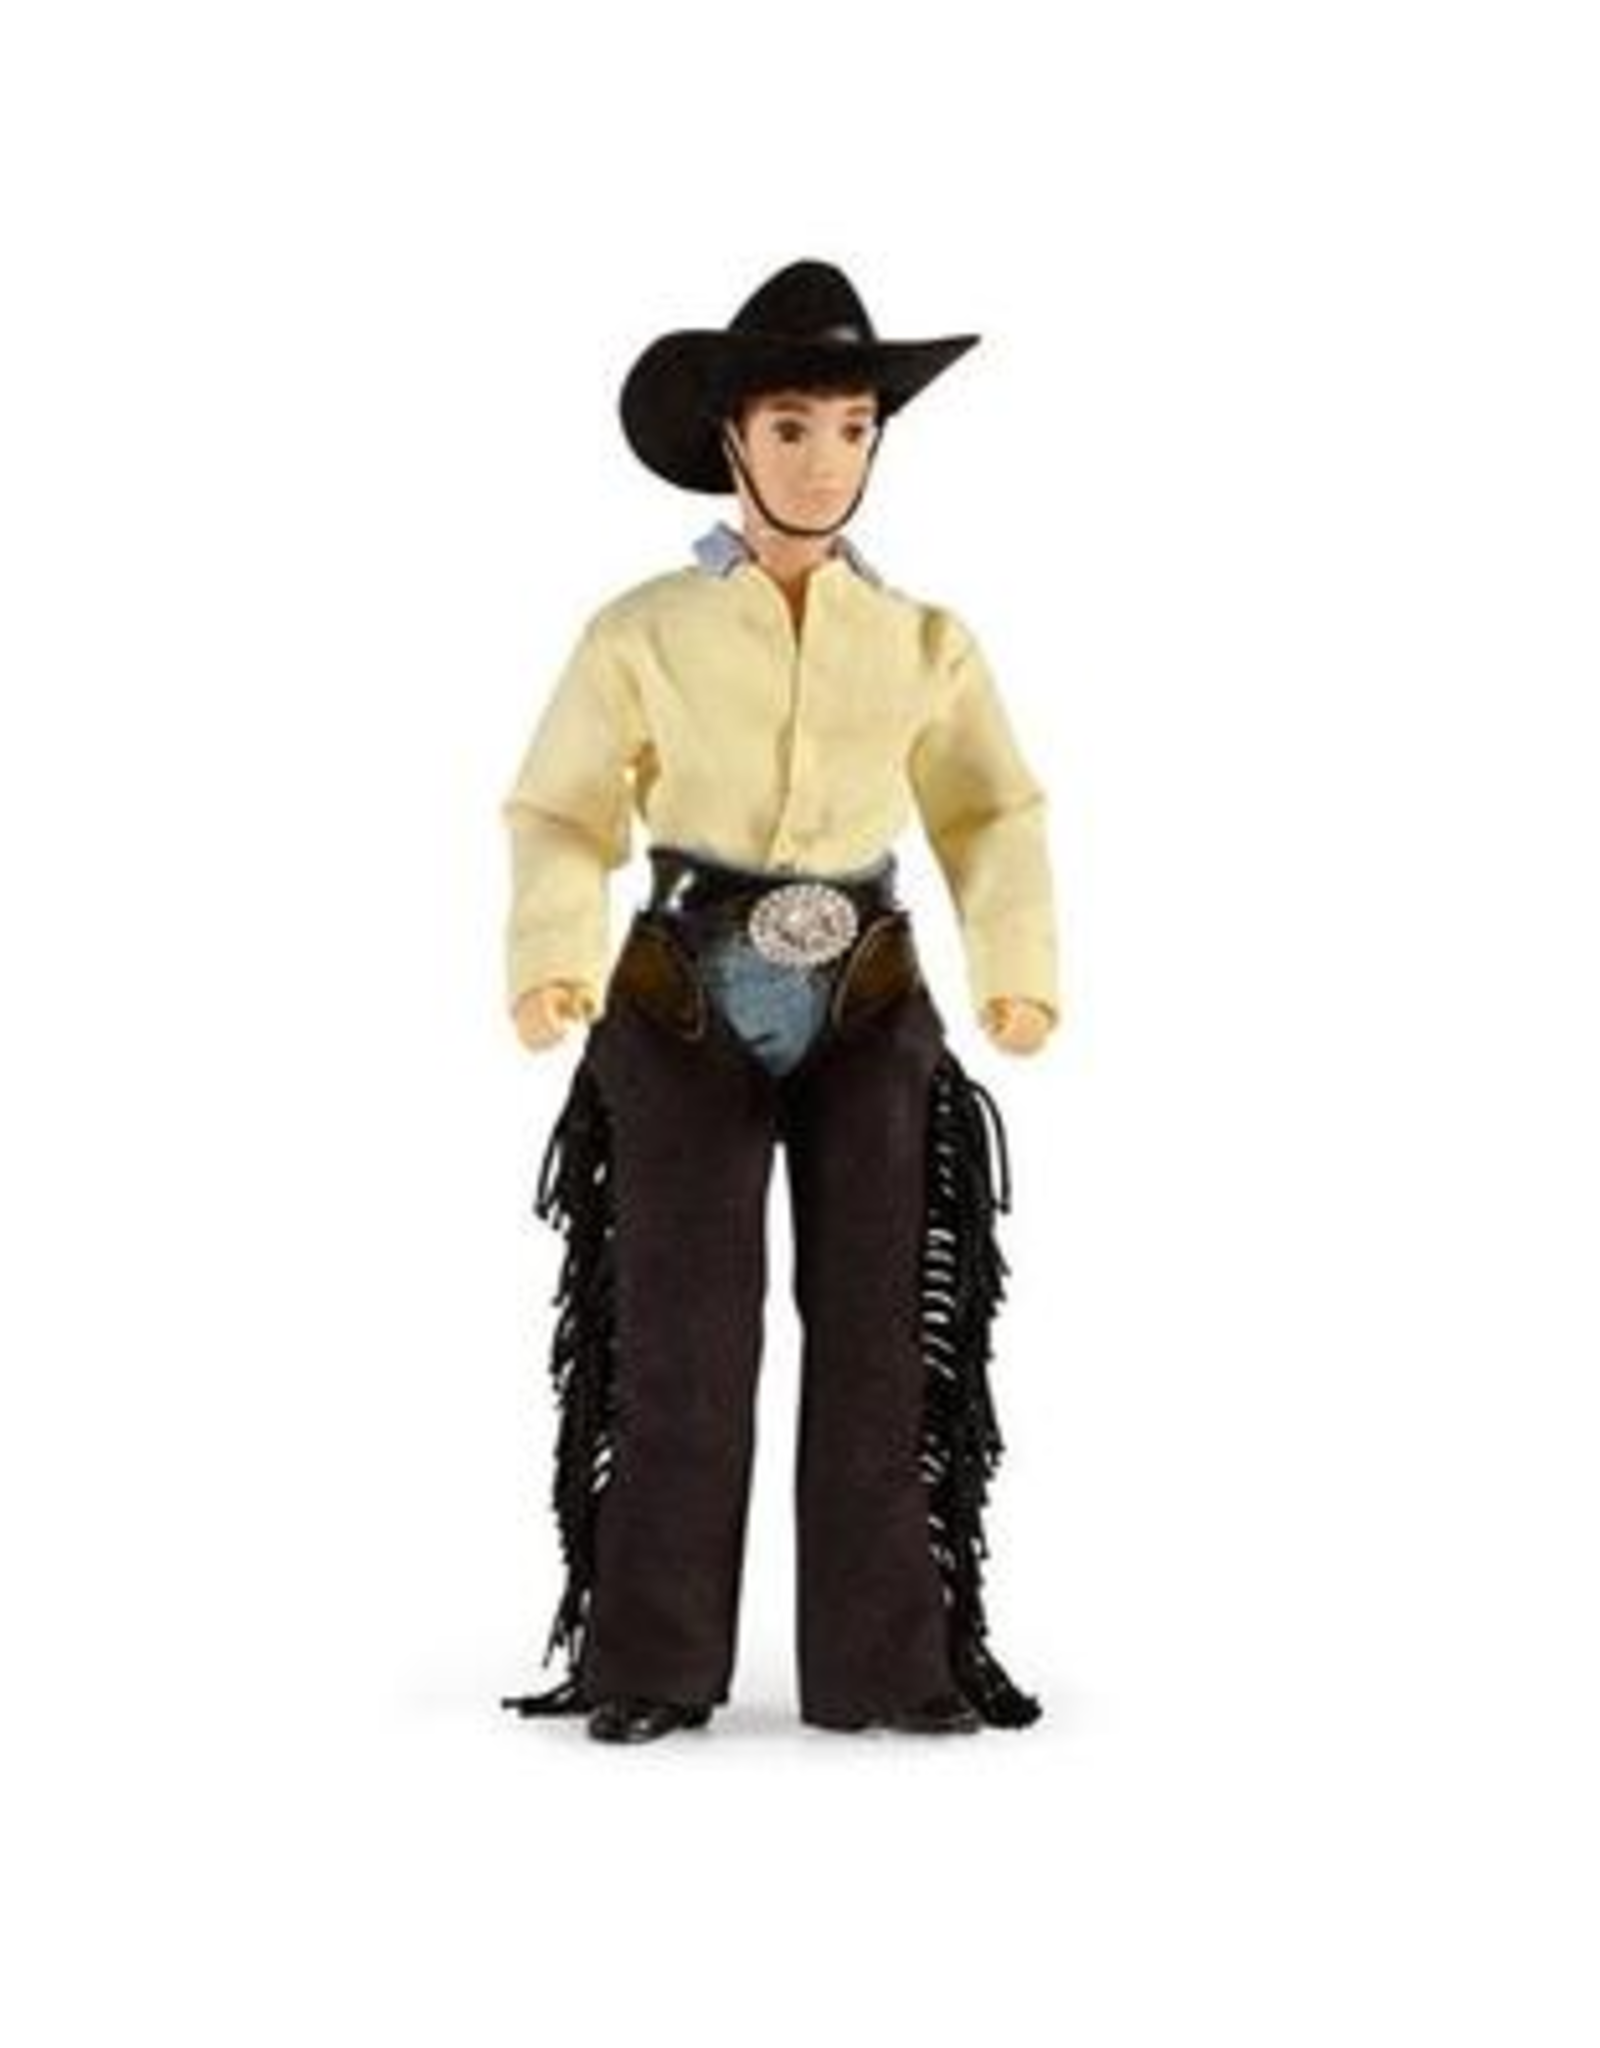 "Reeves International Austin Cowboy - 8"" Figure"